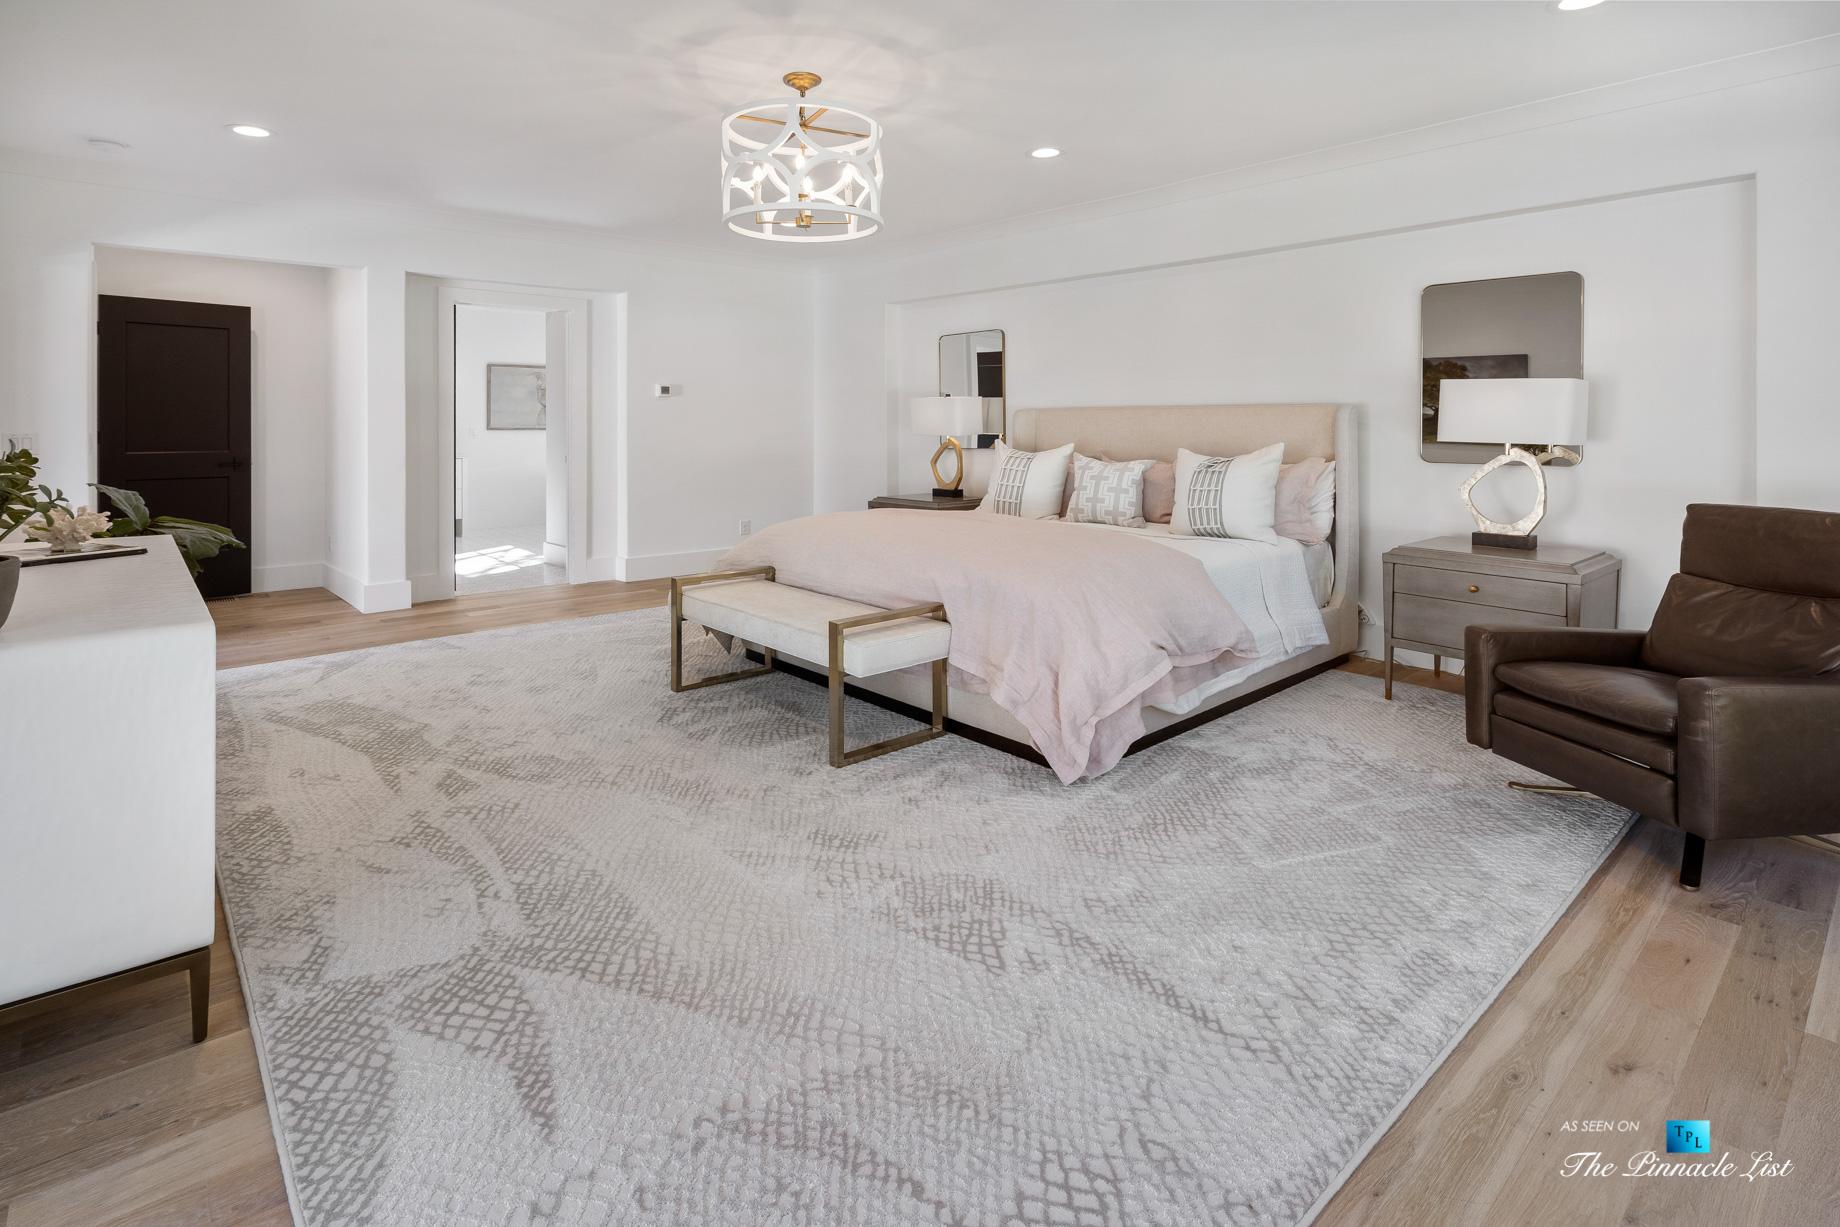 447 Valley Rd NW, Atlanta, GA, USA - Master Bedroom - Luxury Real Estate - Tuxedo Park Home